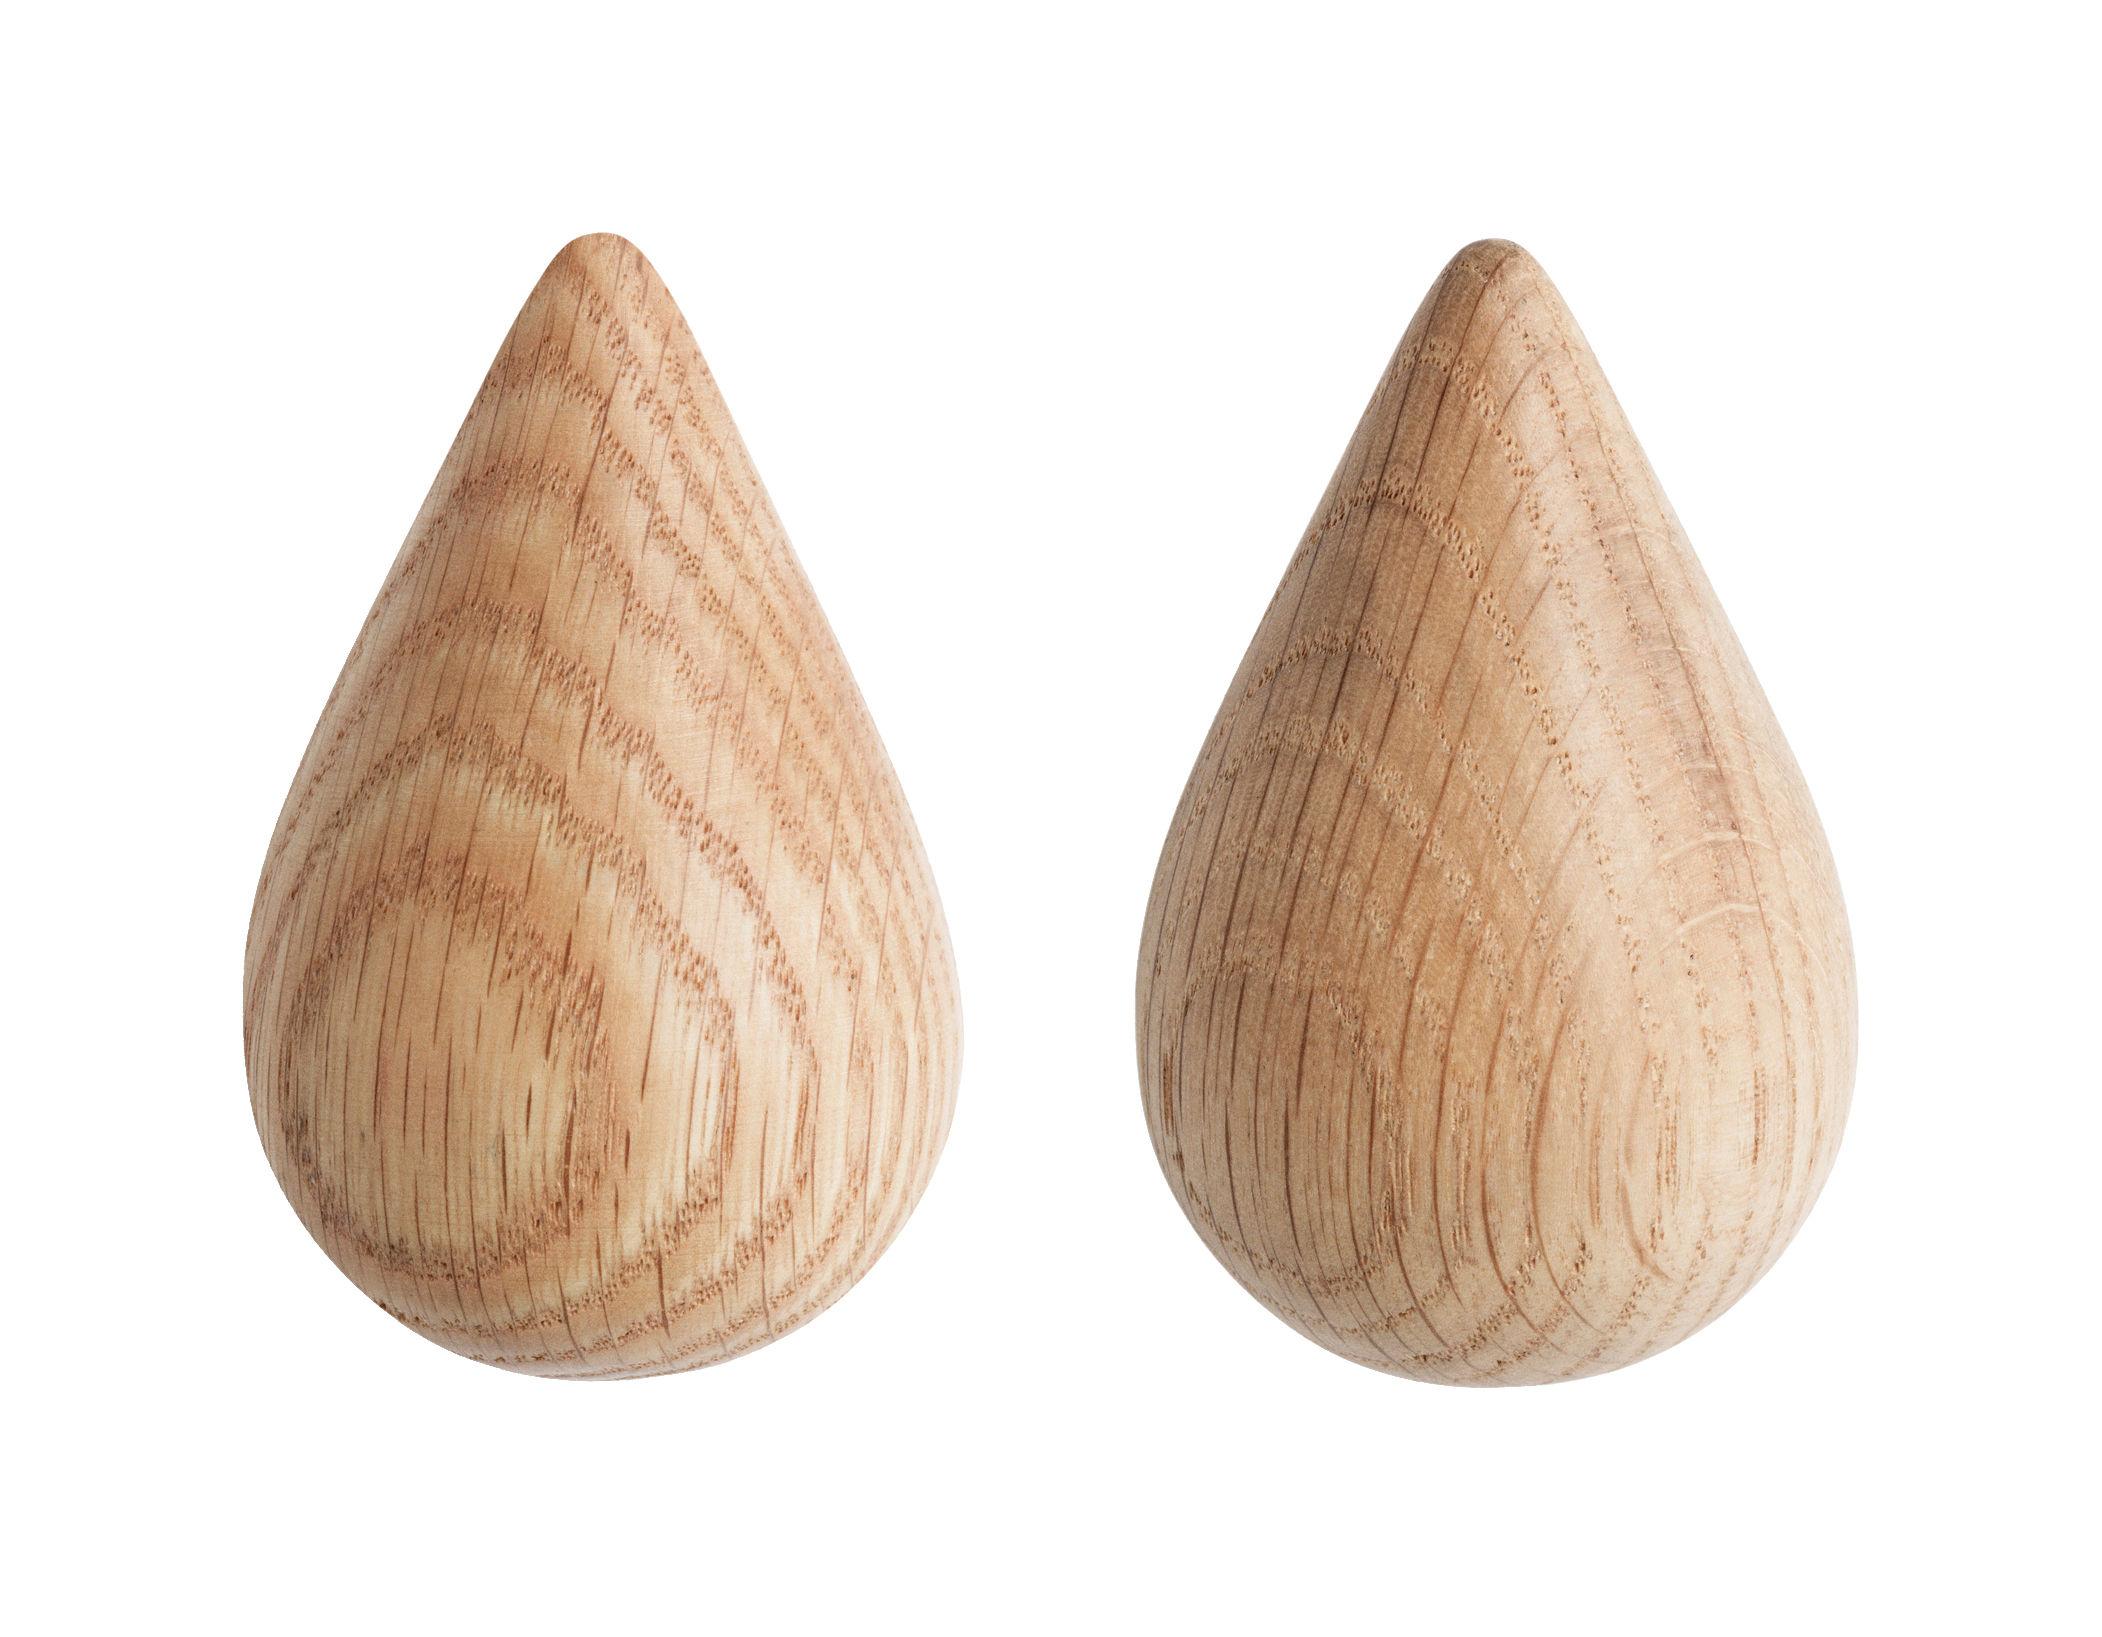 Furniture - Coat Racks & Pegs - Dropit Hook by Normann Copenhagen - Natural - Small / H 7,7 cm - Wood